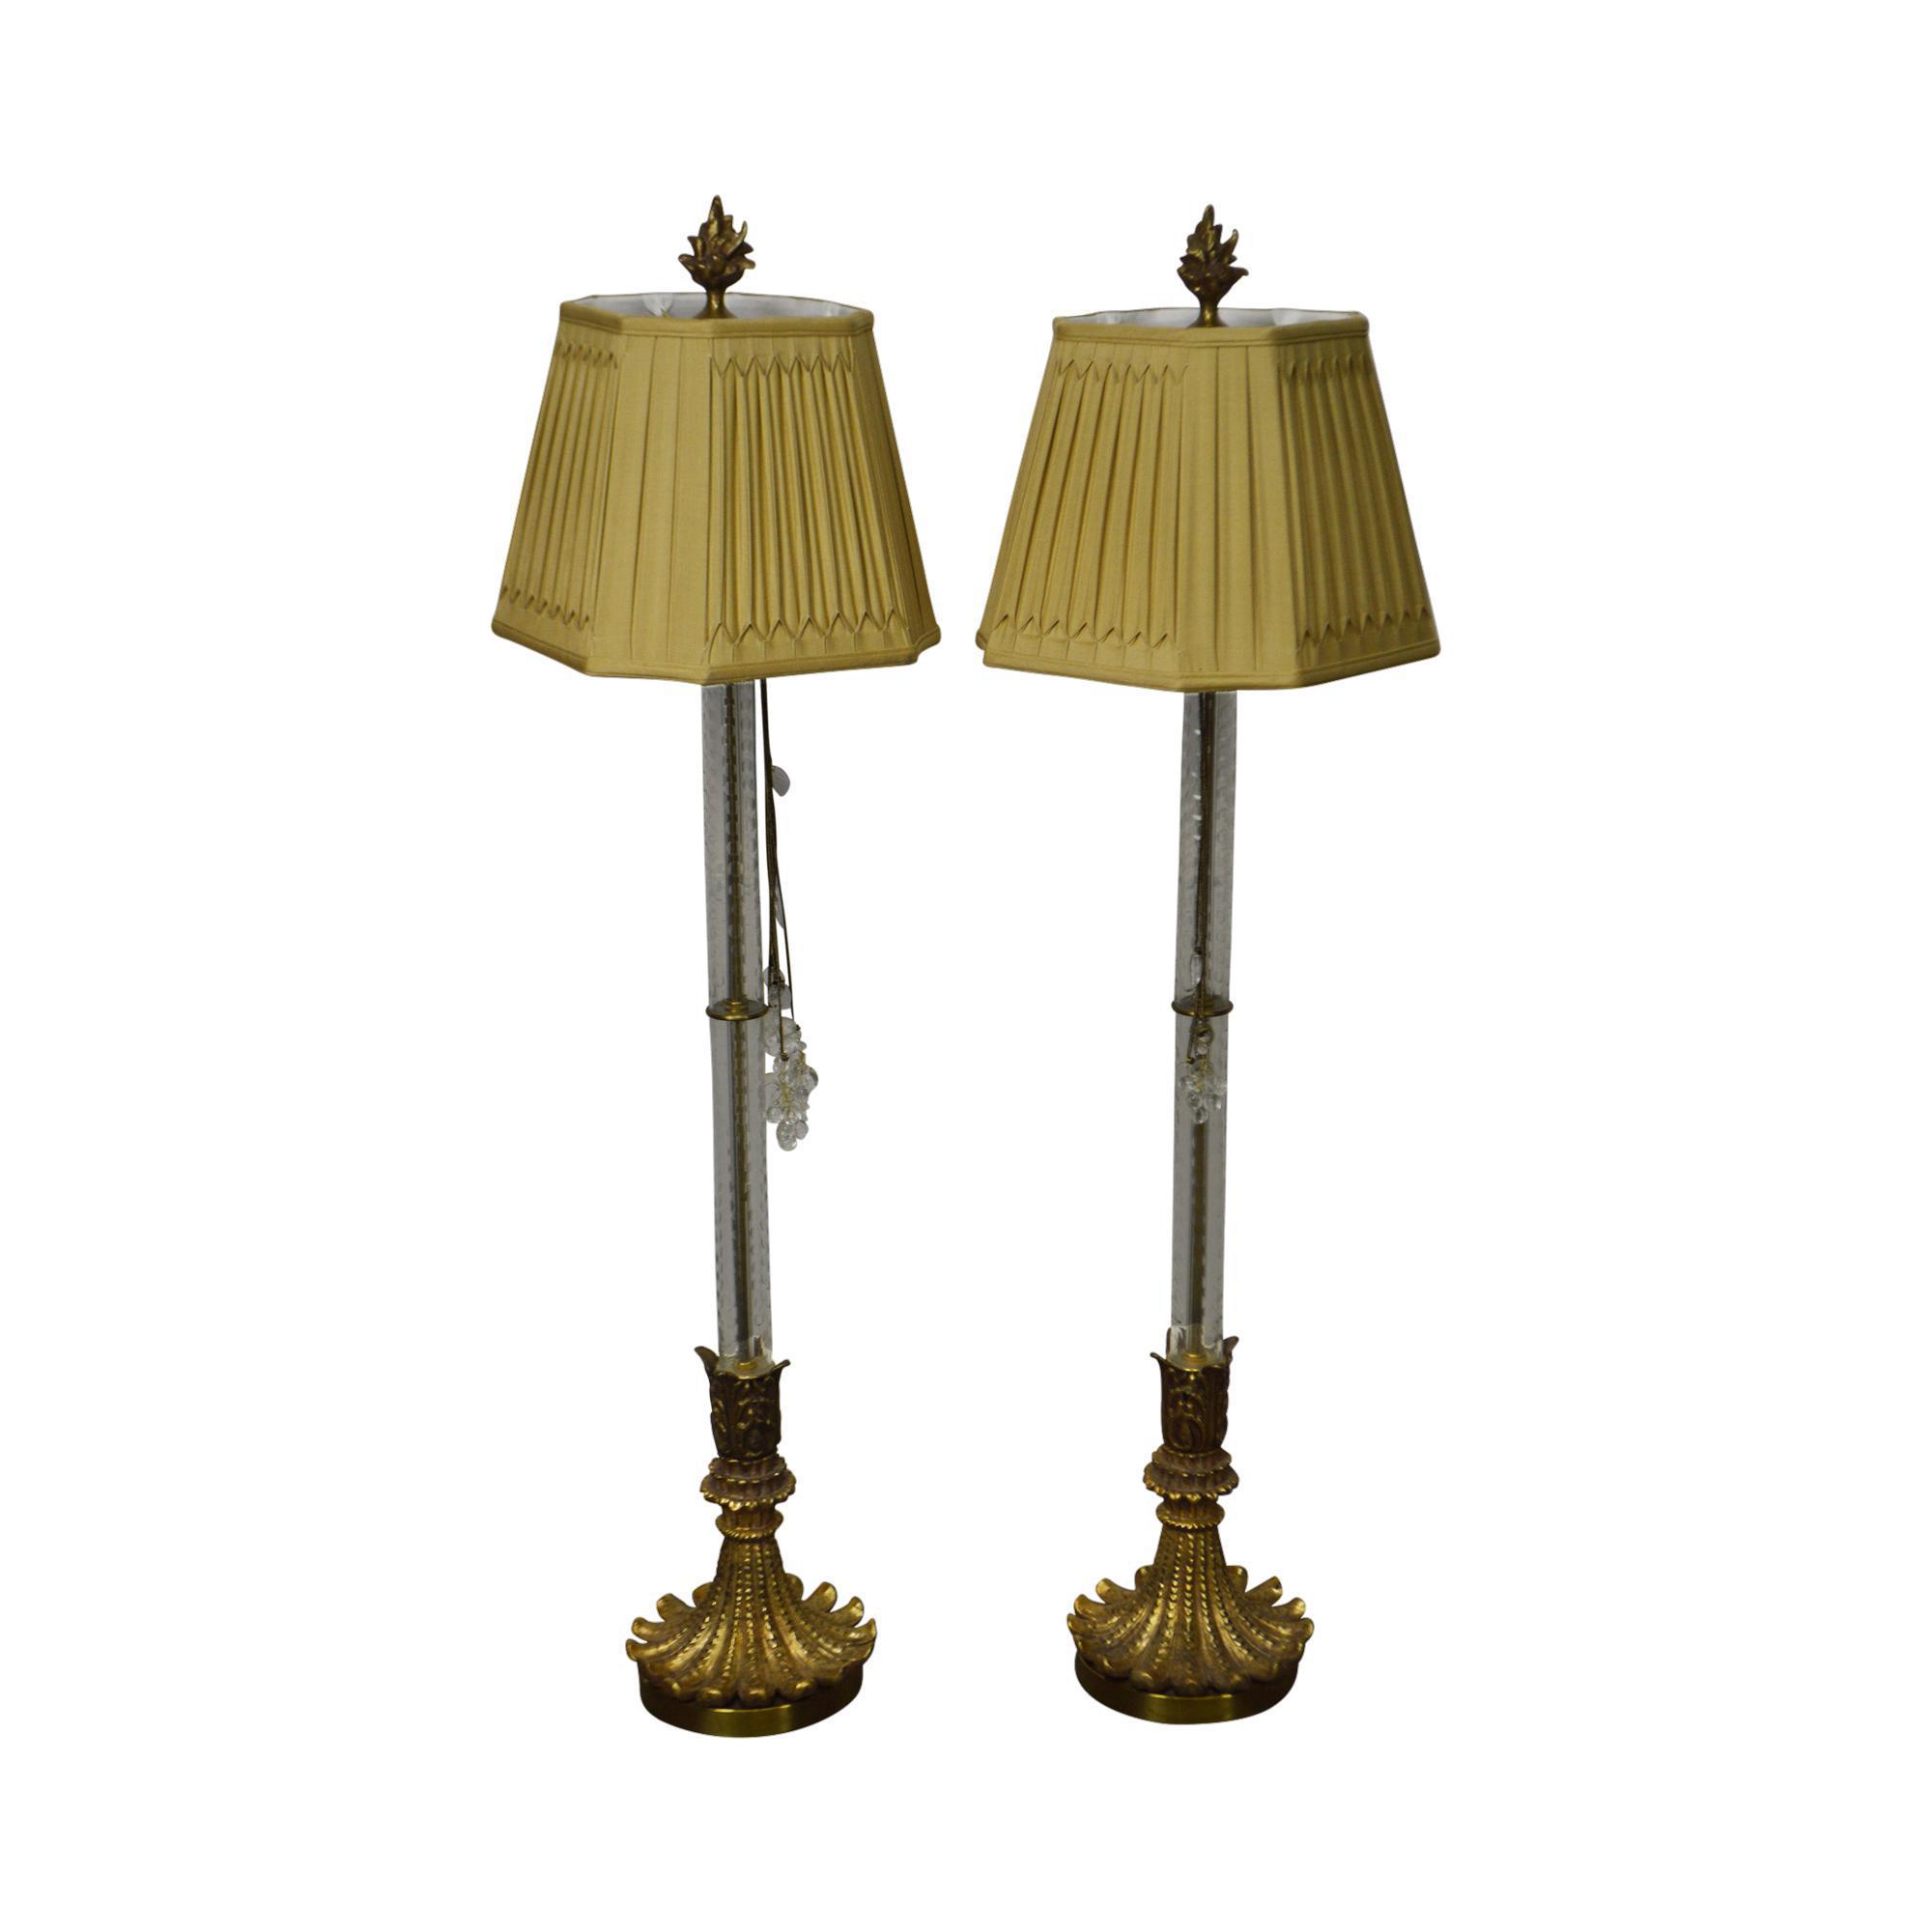 John richard pair of tall glass column gilt base table lamps john richard pair of tall glass column gilt base table lamps chairish geotapseo Image collections